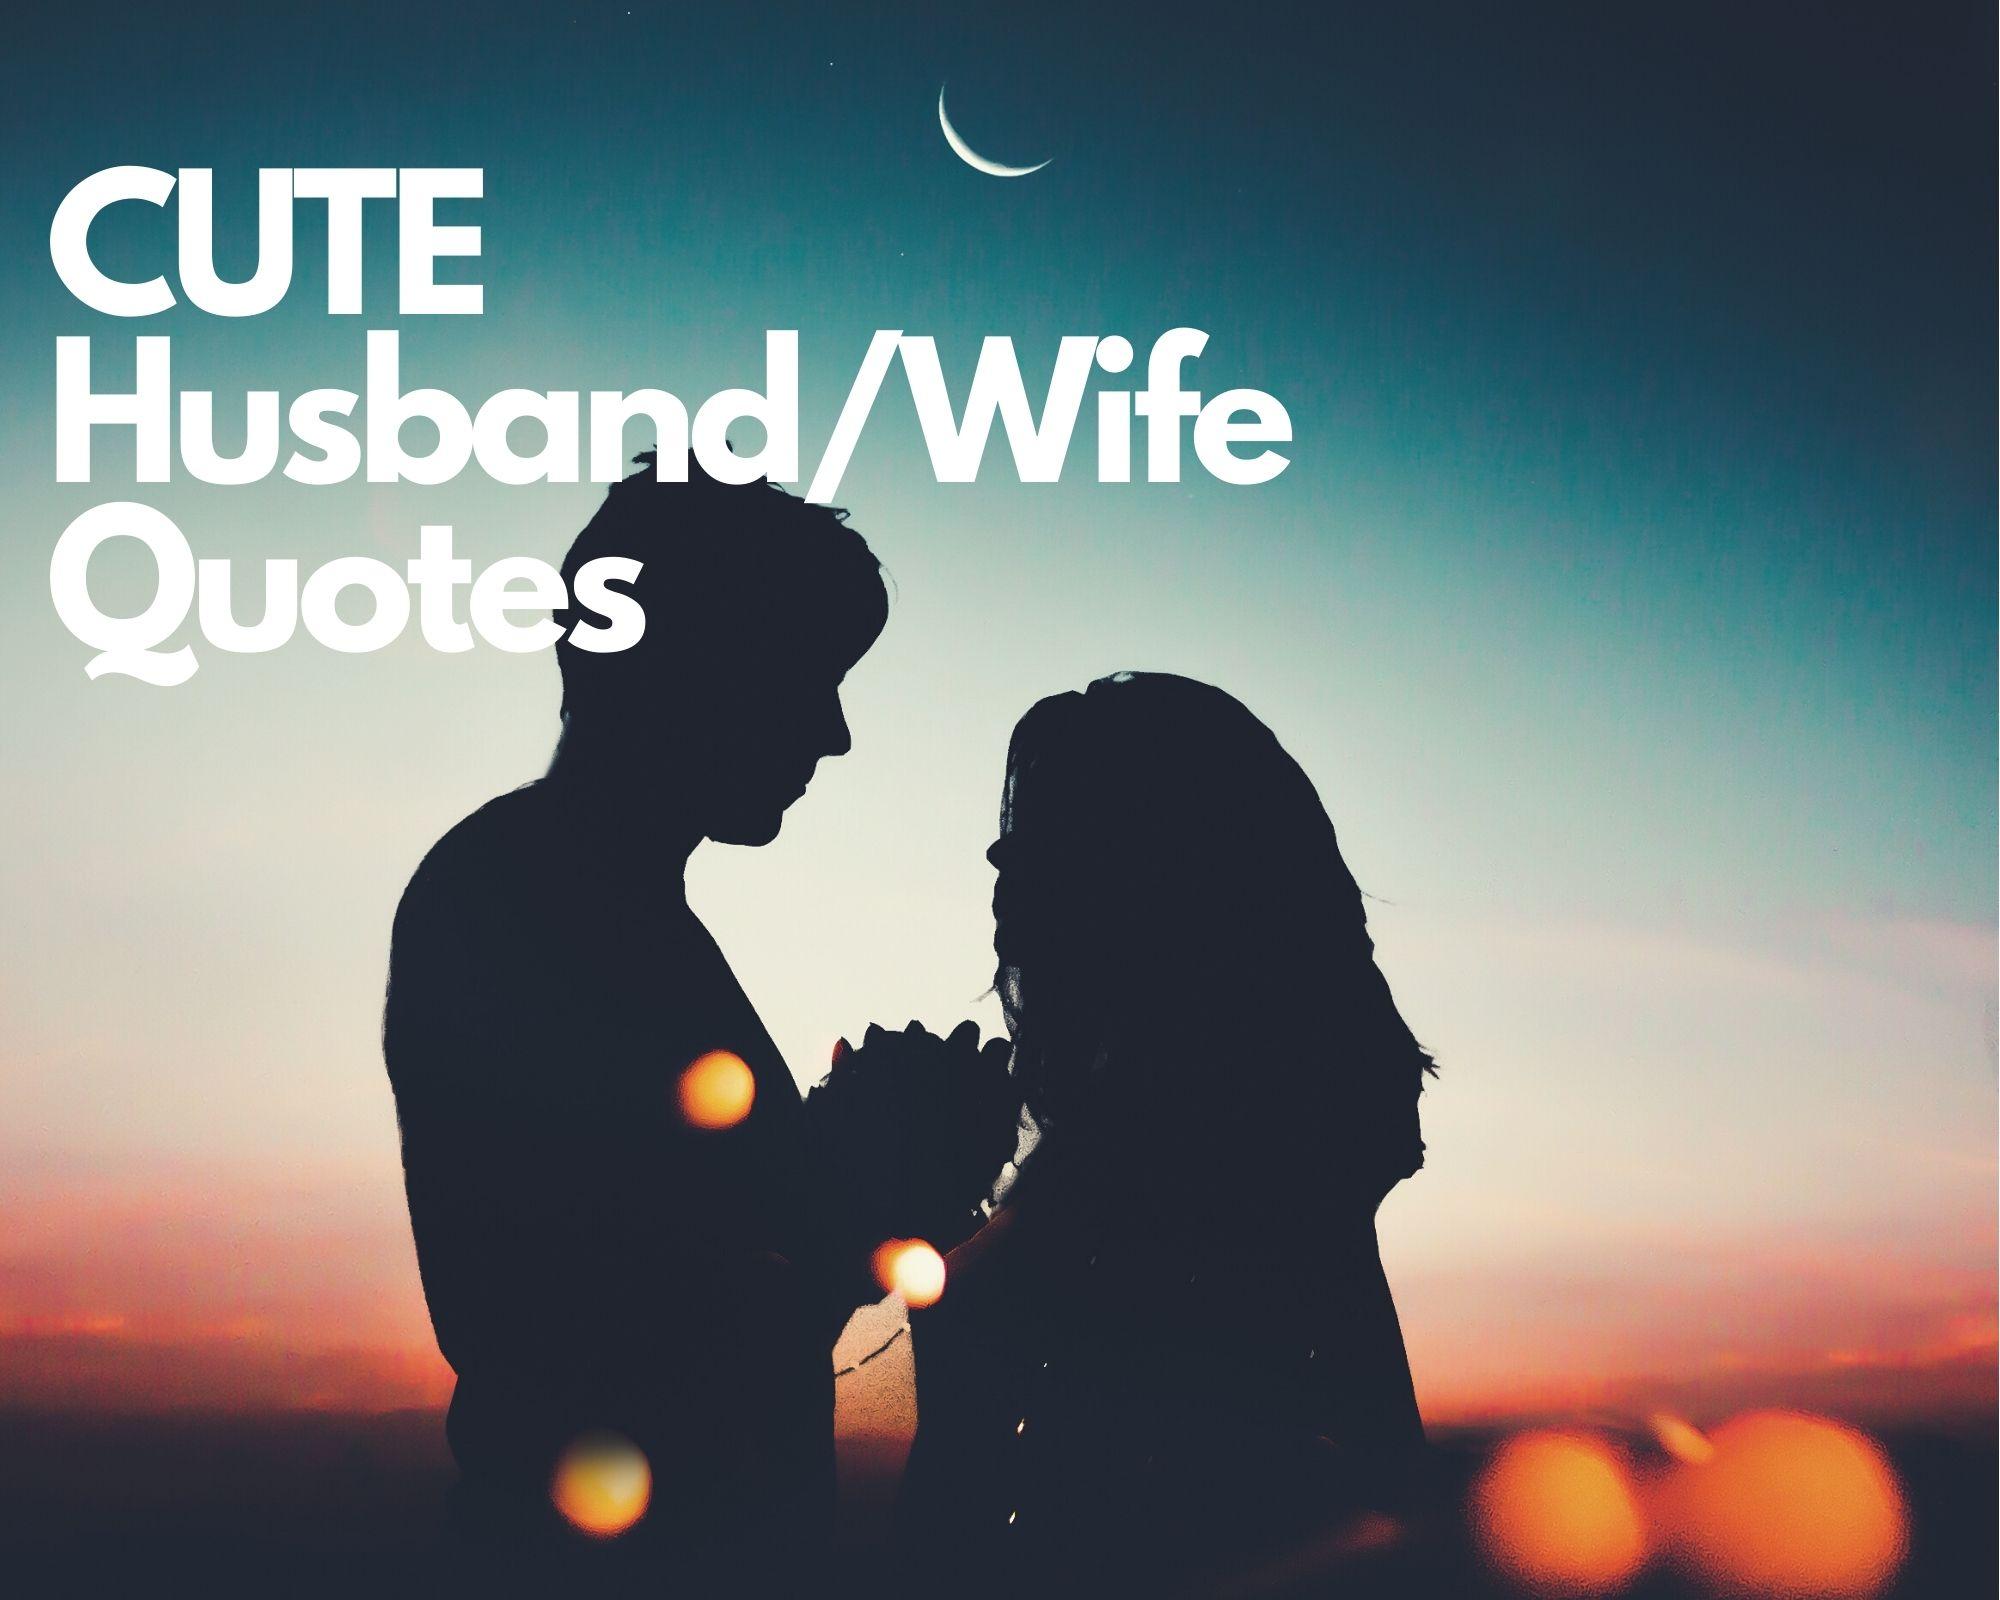 husband wife quotes, husband quotes, husband captions, wife quotes, love quotes, caption store